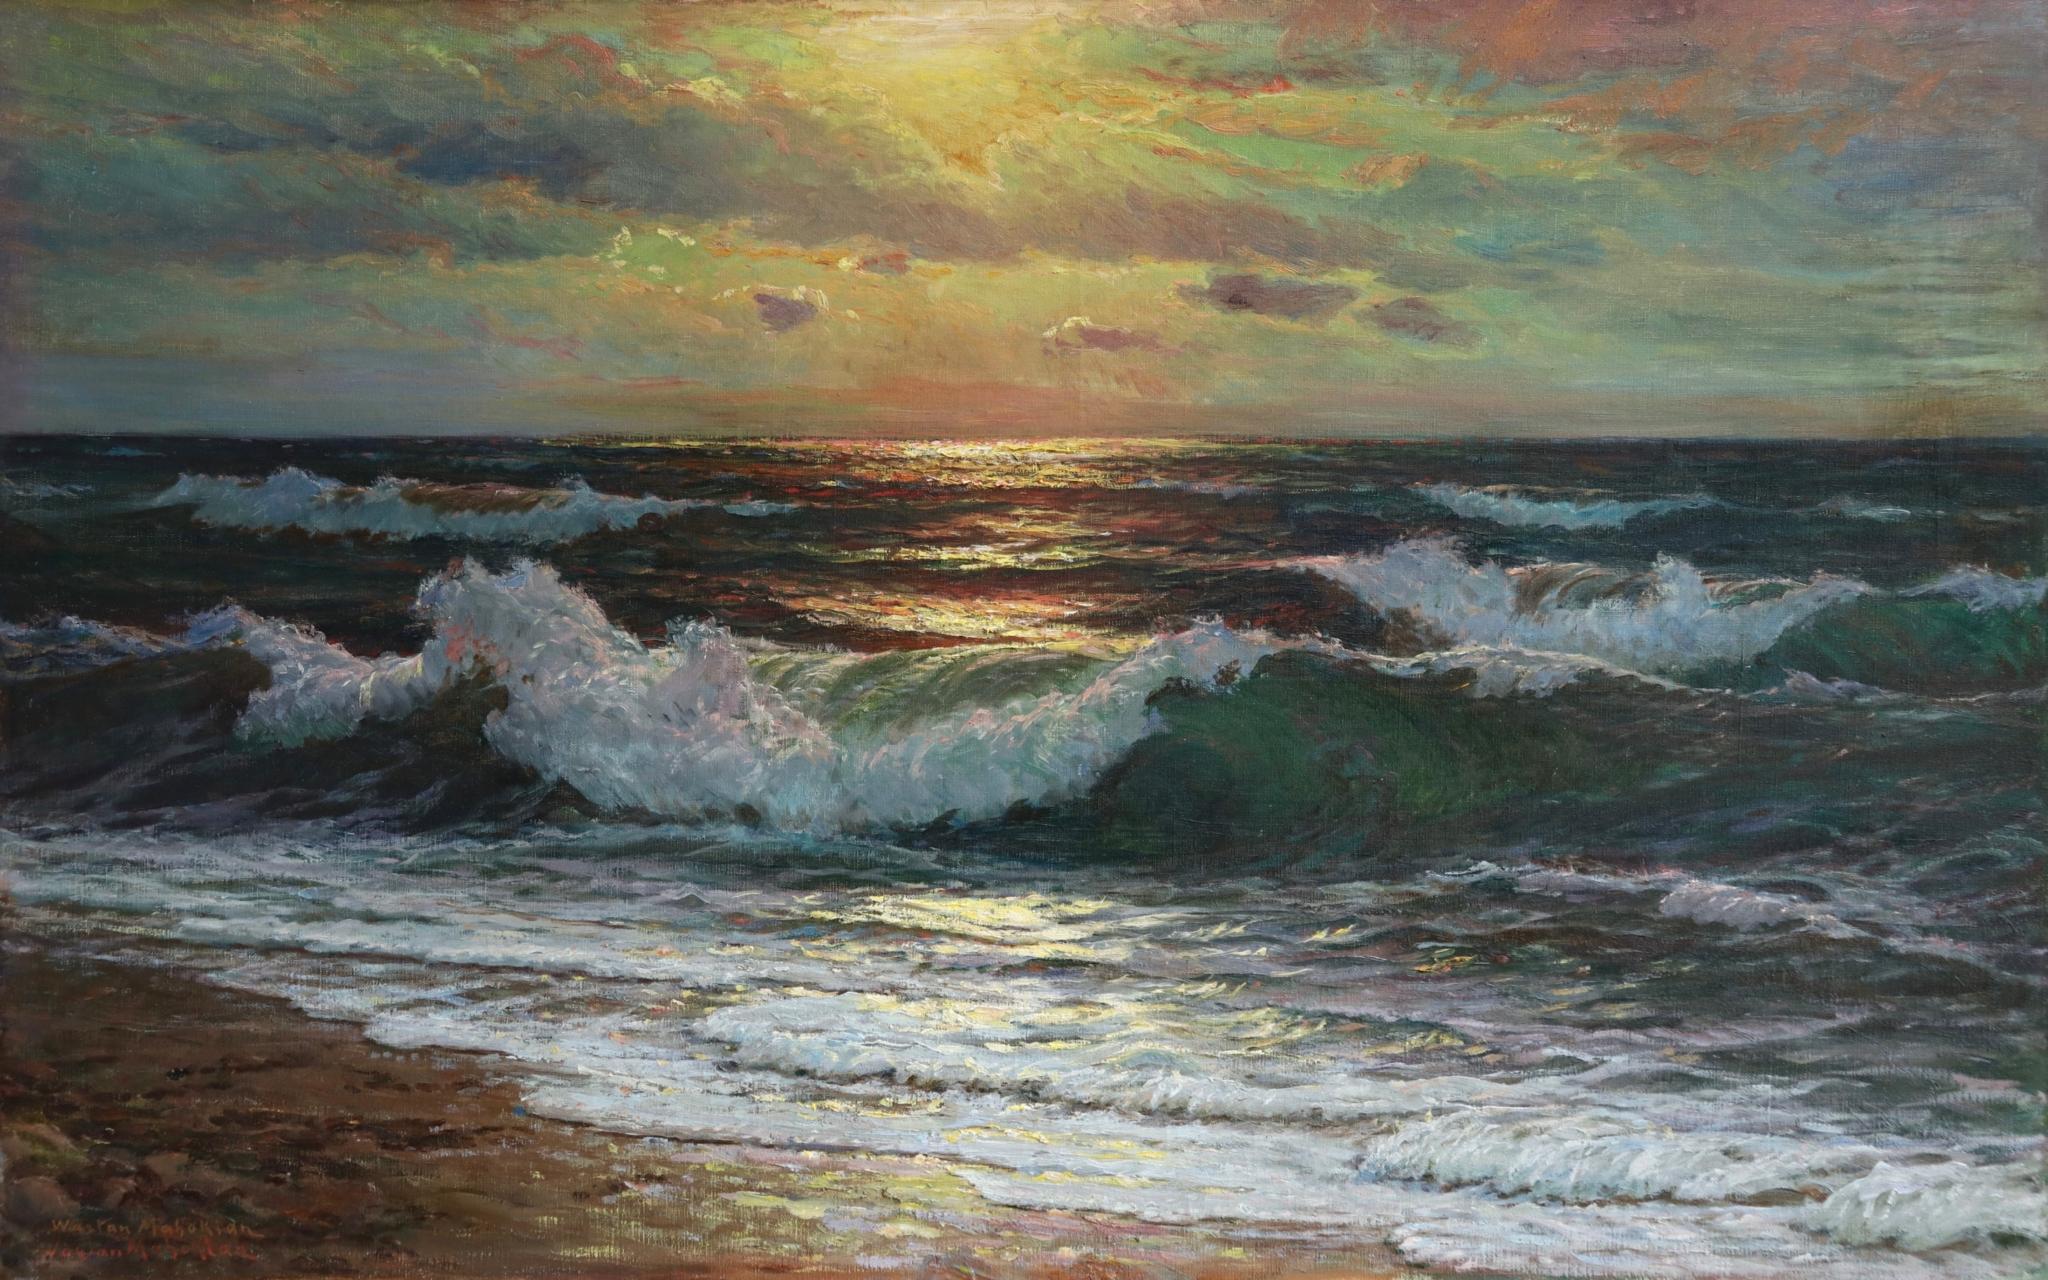 Sunset - 20th Century Impressionist Oil, Seascape by Vartan Makhokhian